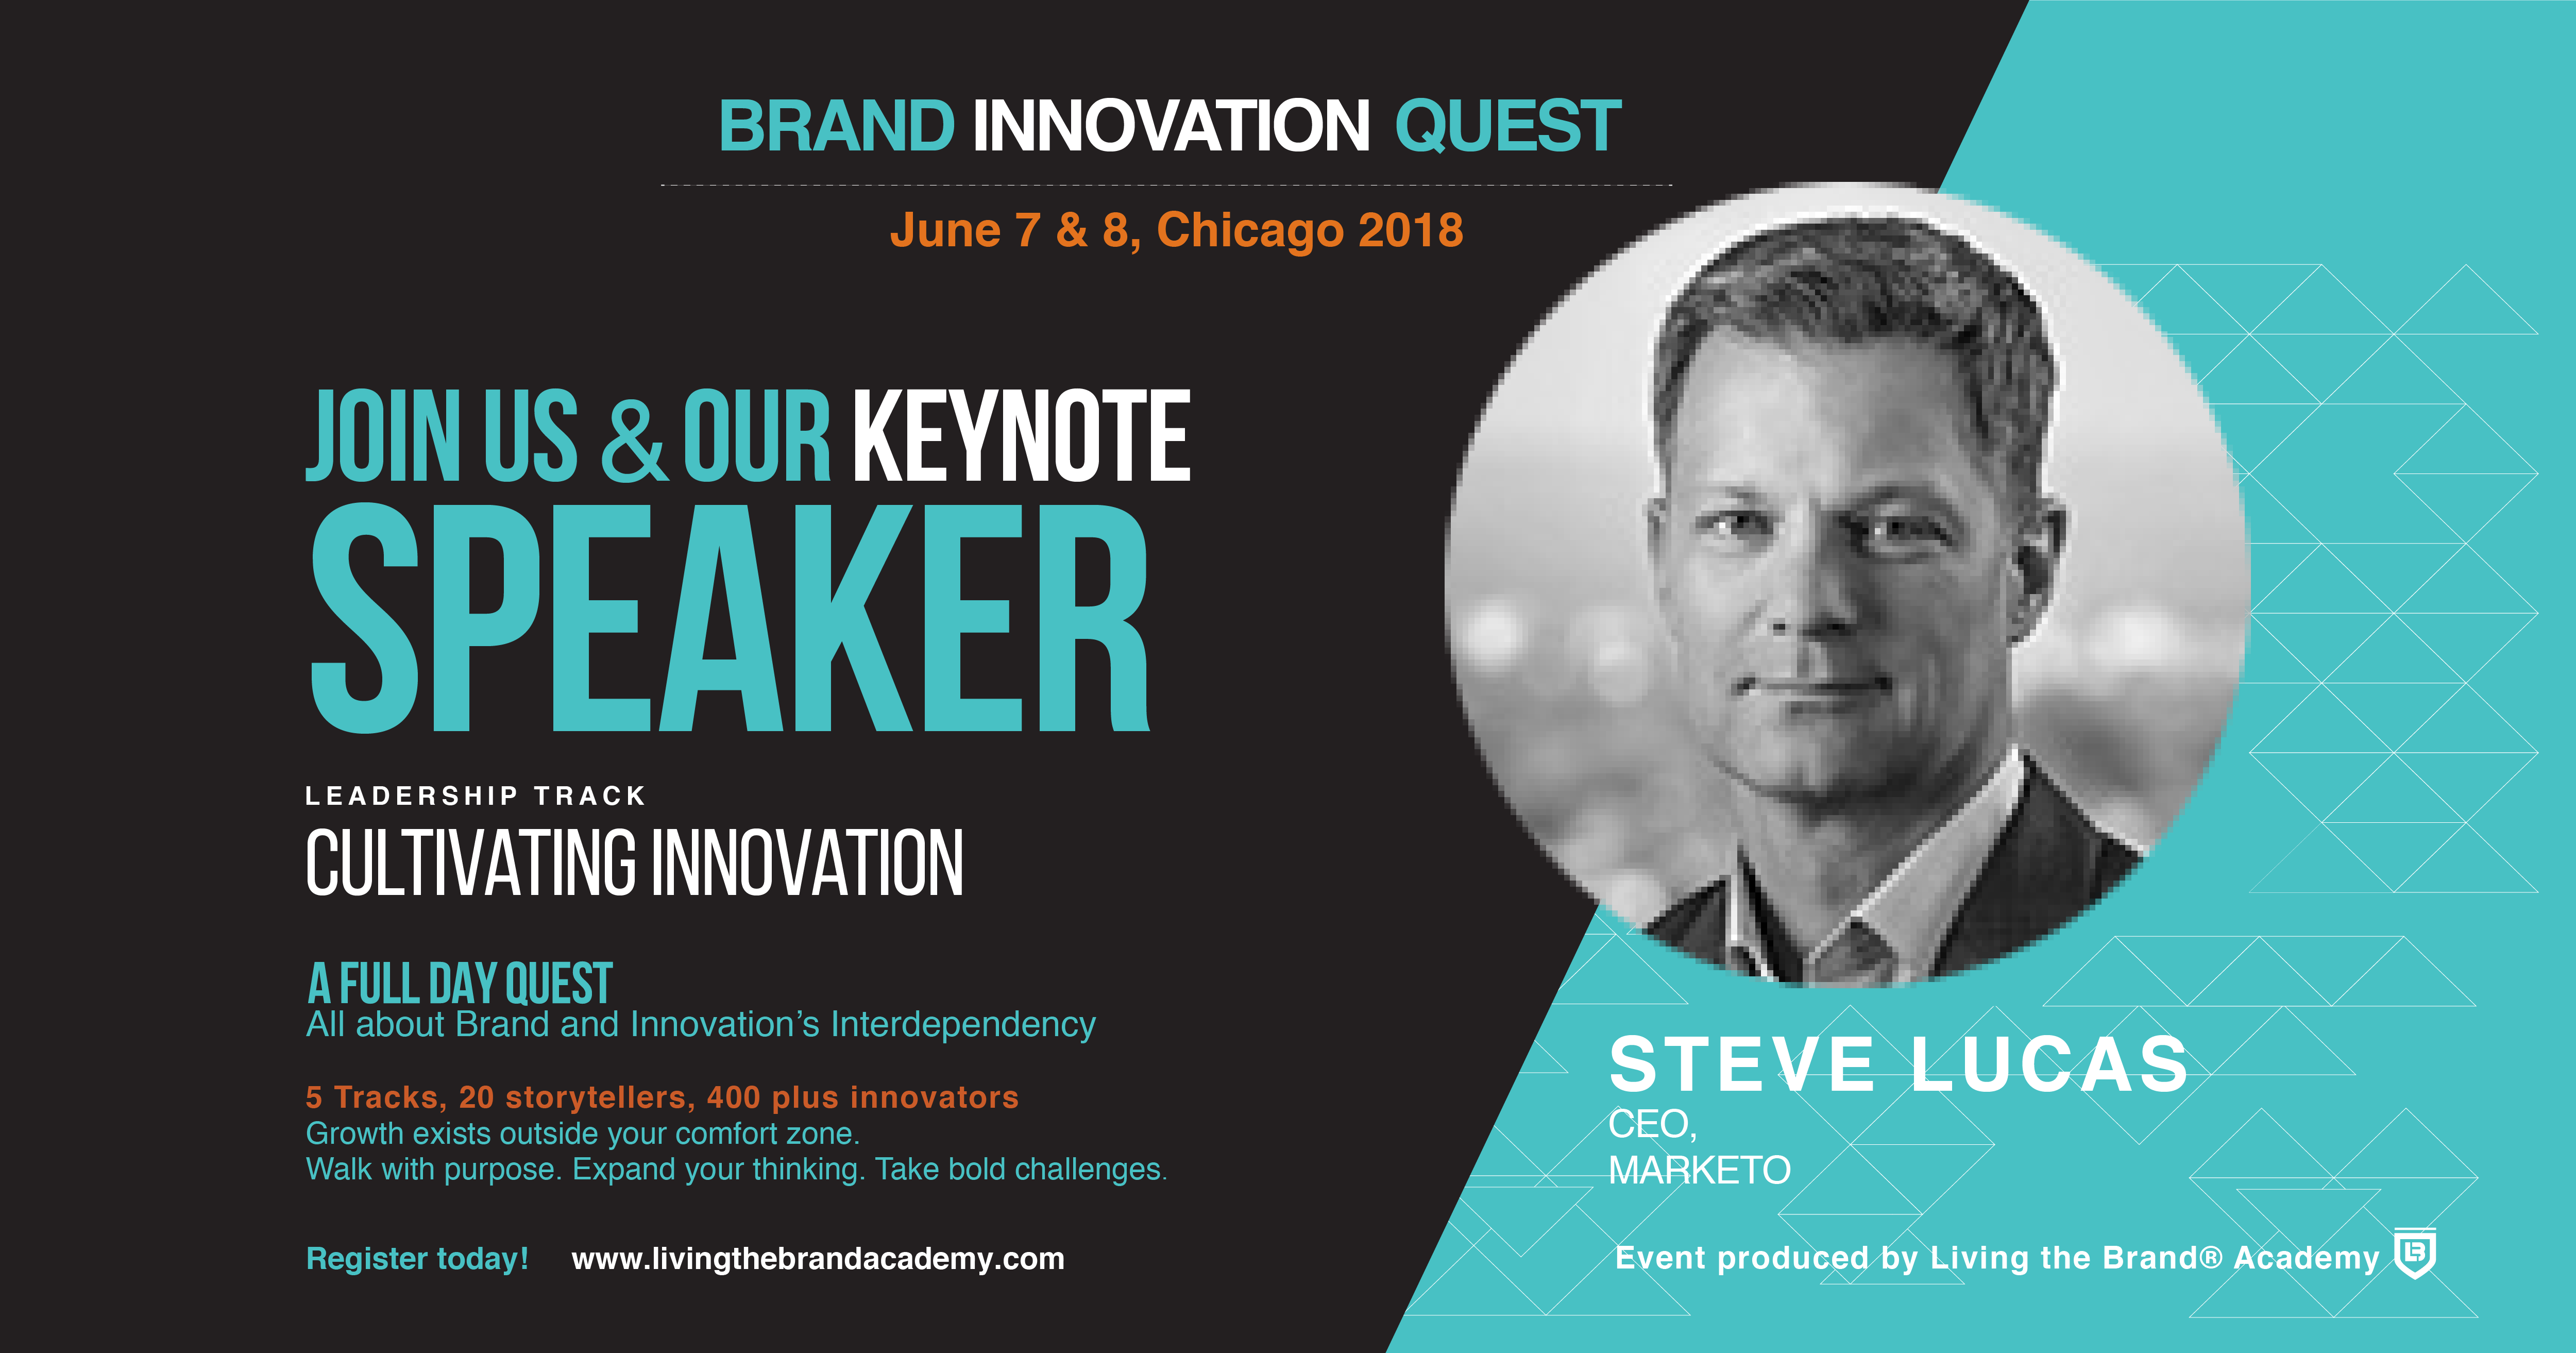 BRAND INNOVATION QUEST Chicago 2018 Kickoff Reception